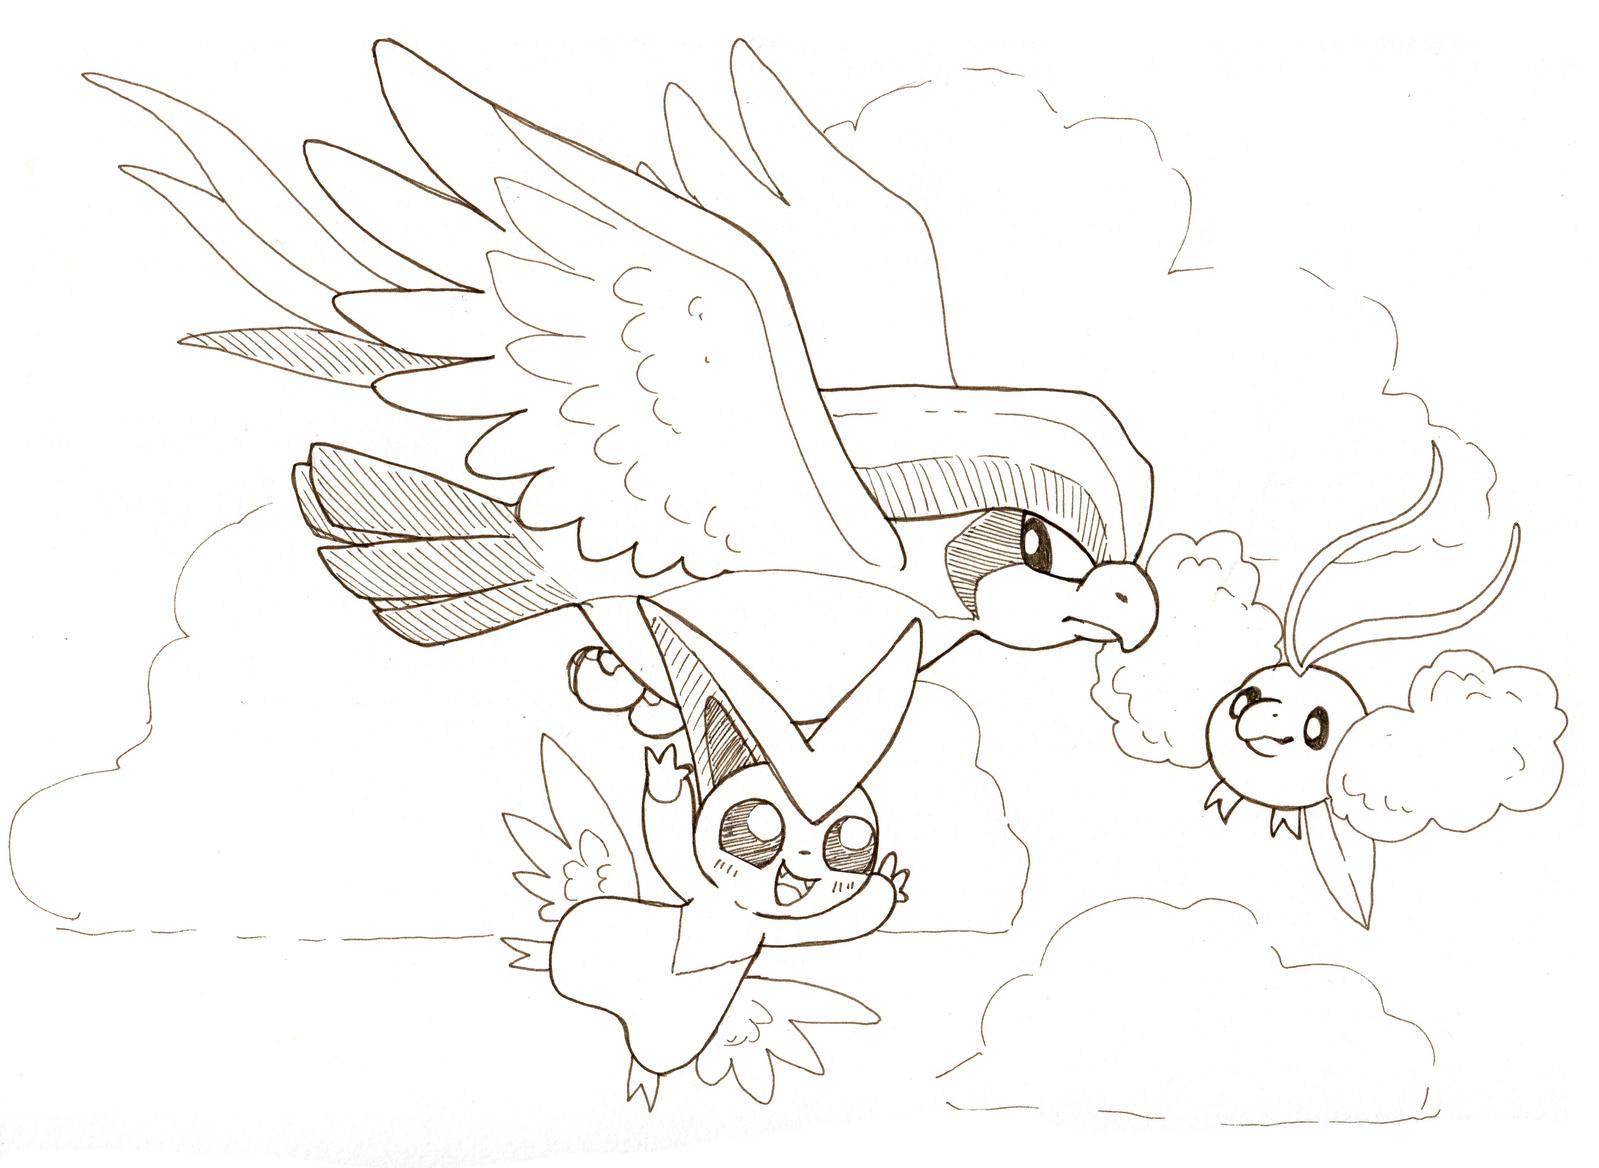 Friends by owlburrow